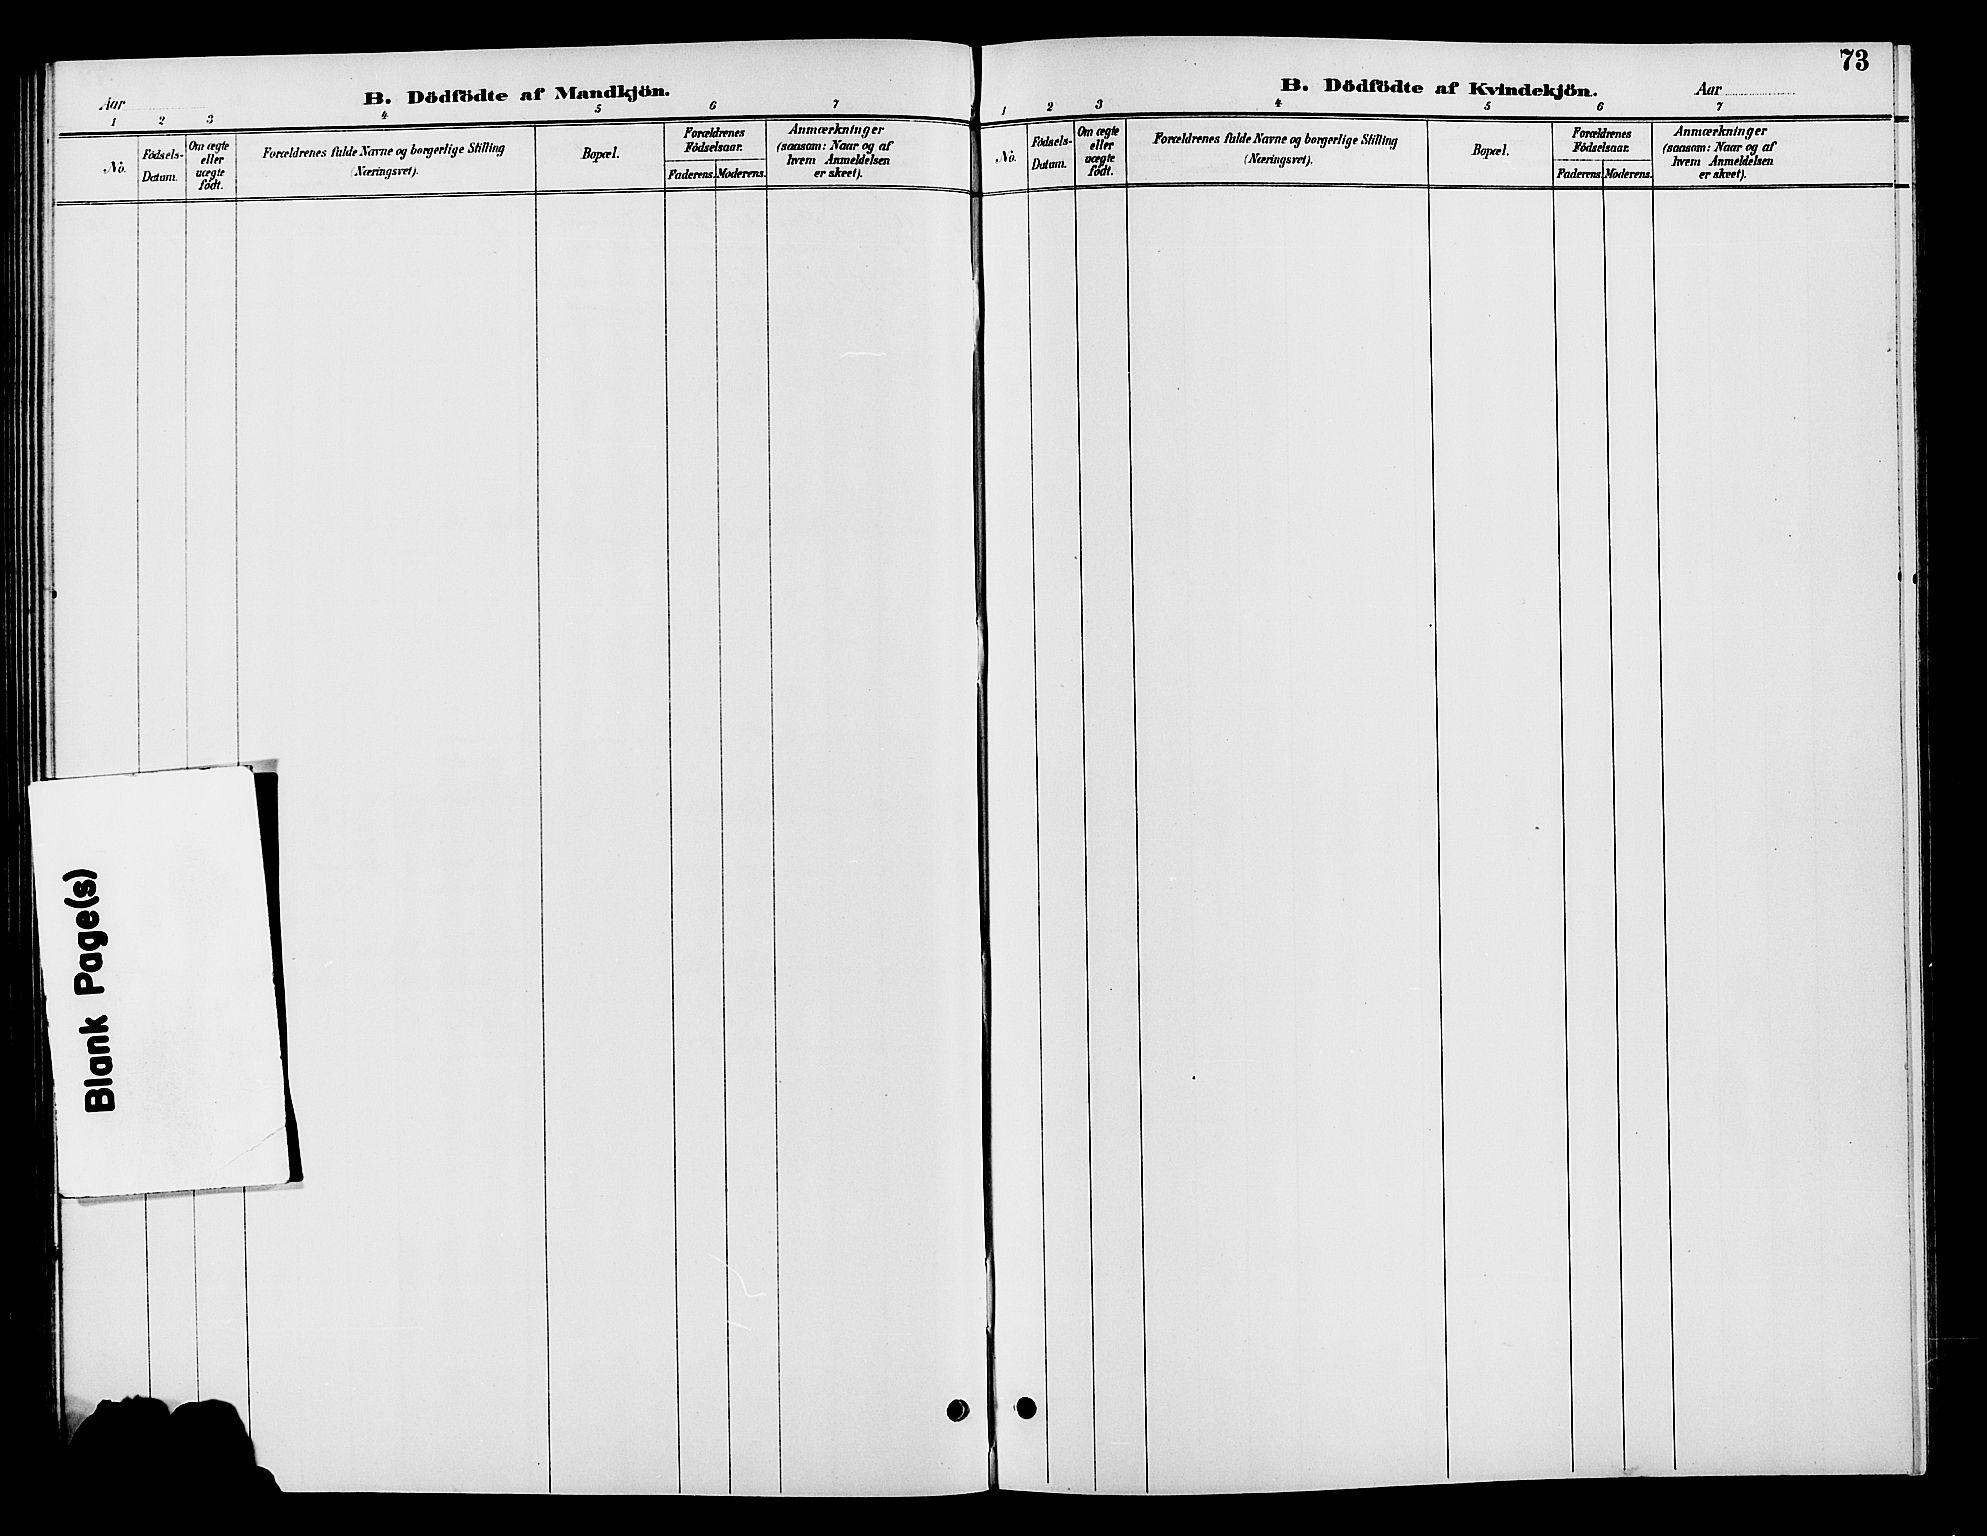 SAH, Vardal prestekontor, H/Ha/Hab/L0009: Klokkerbok nr. 9, 1894-1902, s. 73